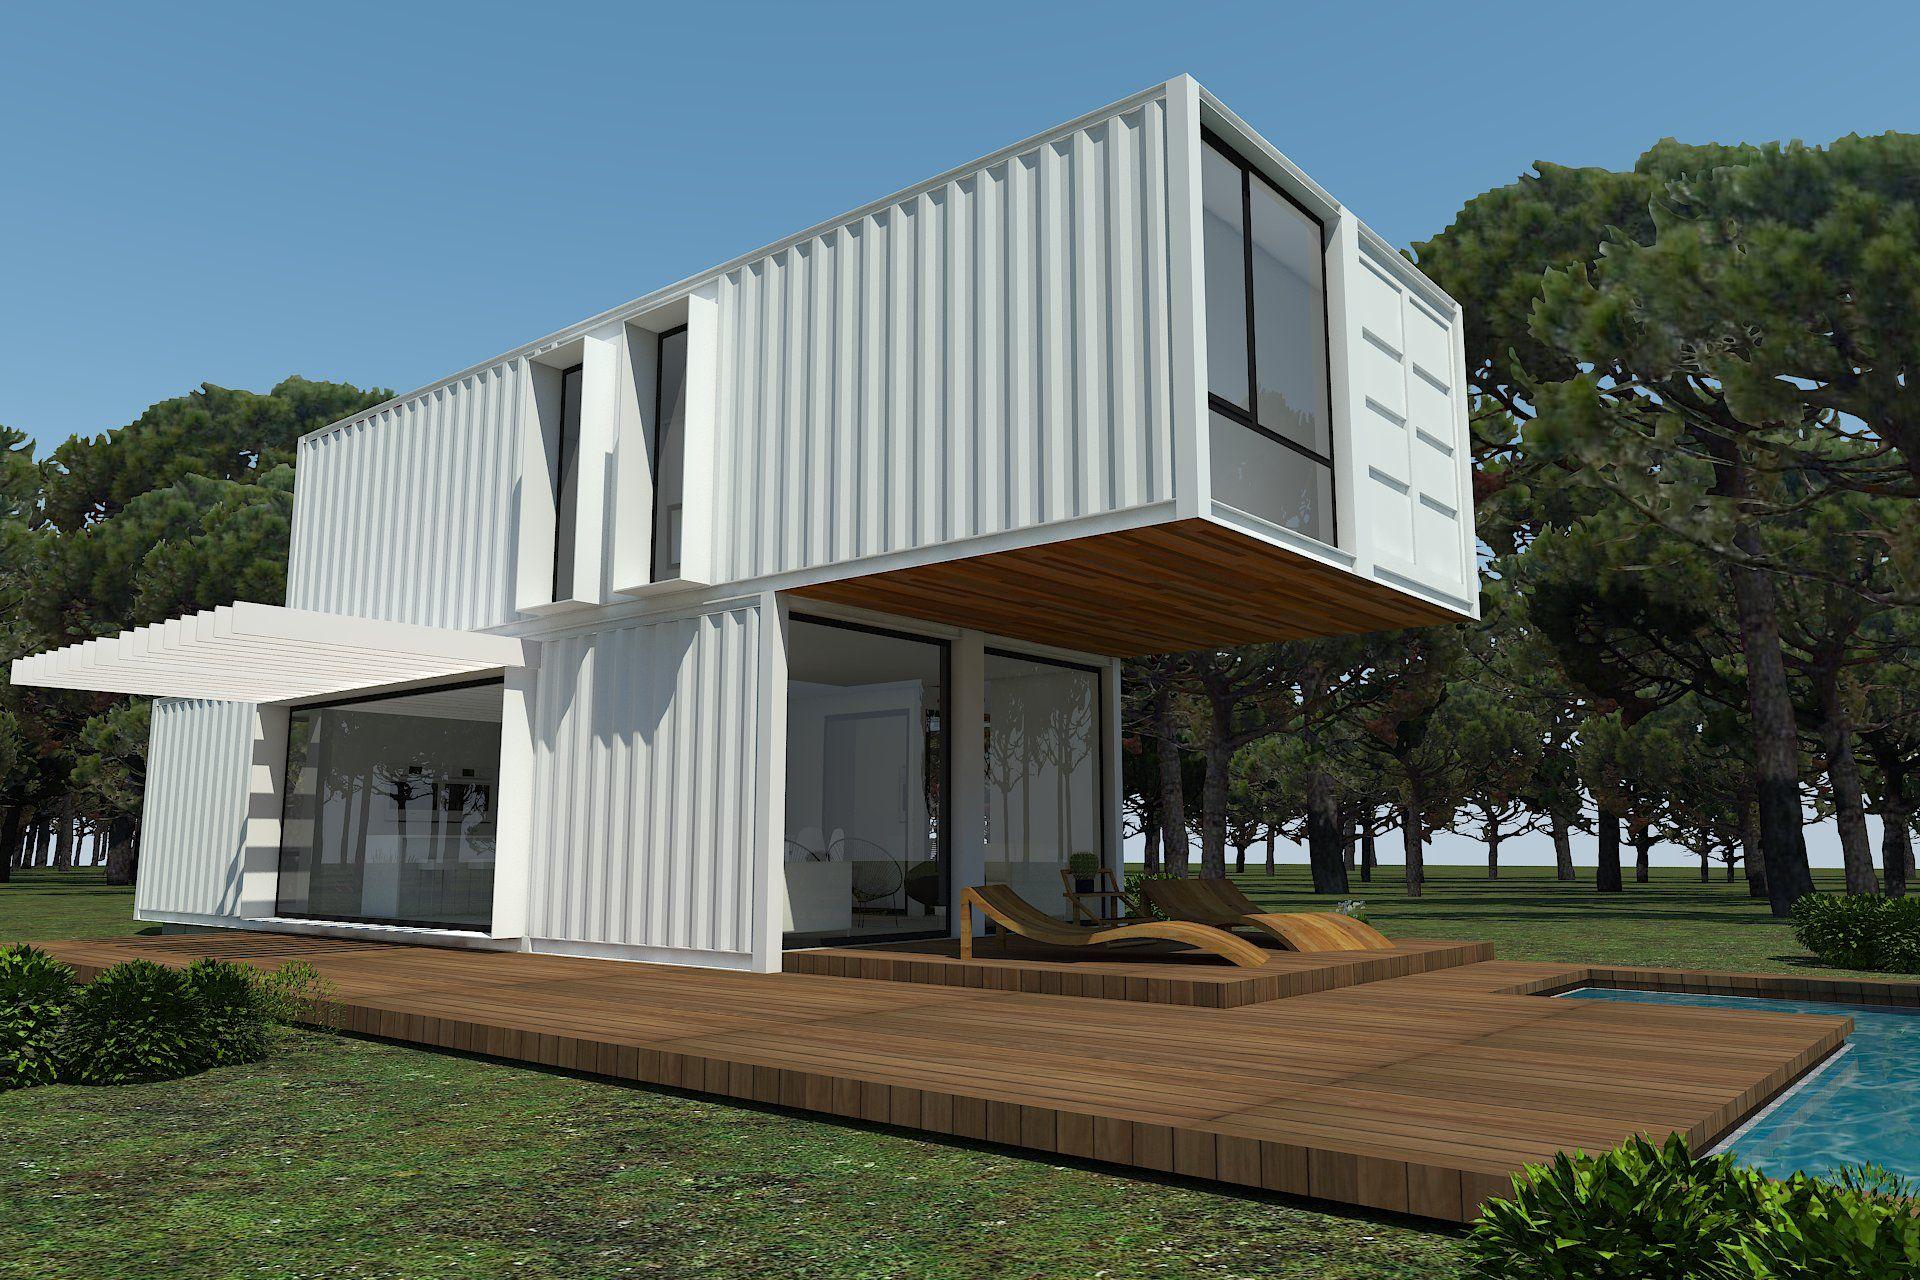 H kub casas prefabricadas en contenedores mar timos mi - Arquitectura contenedores maritimos ...